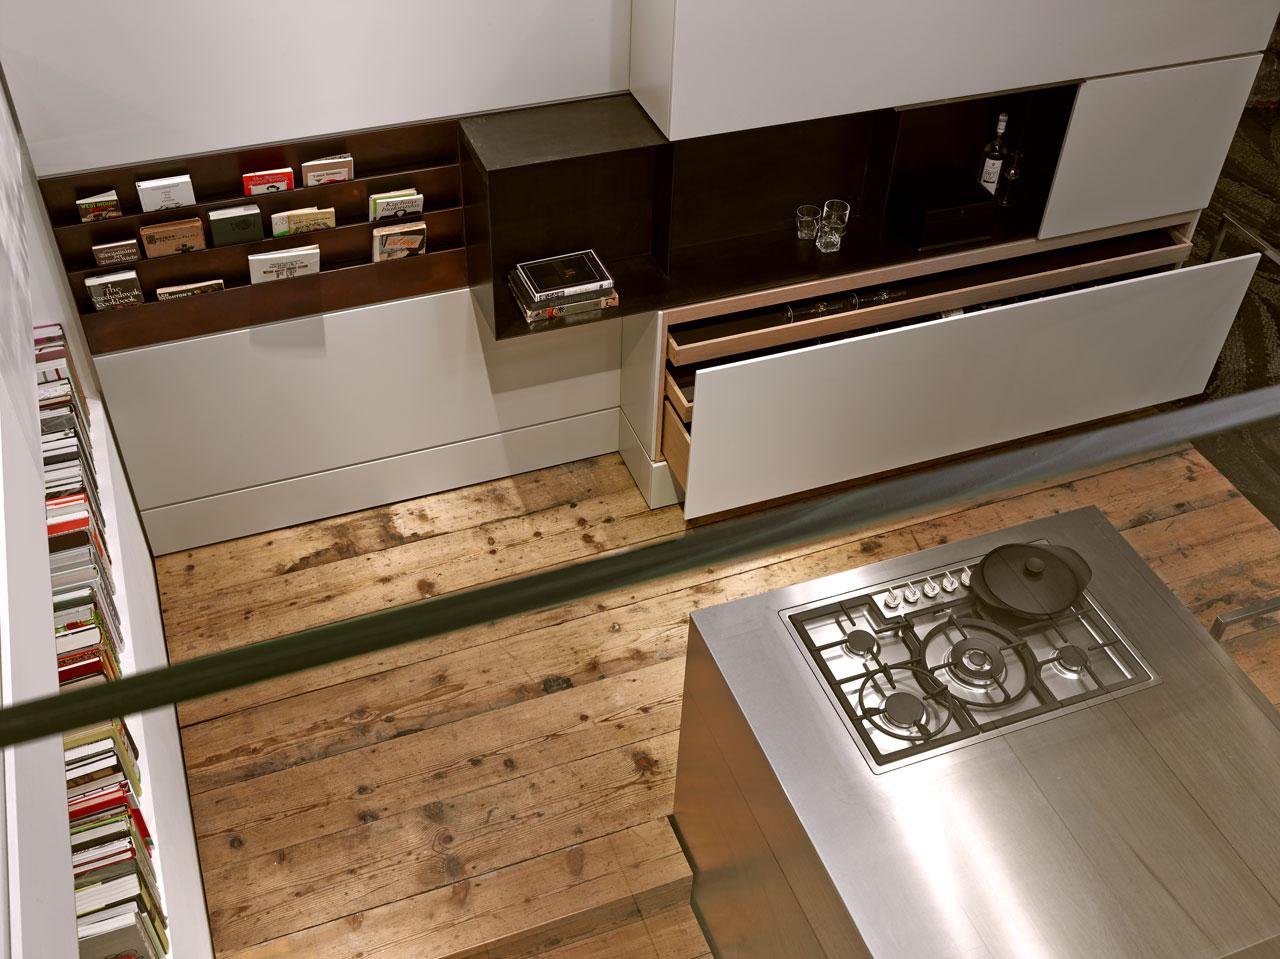 b3 the wabi sabi kitchen. Black Bedroom Furniture Sets. Home Design Ideas